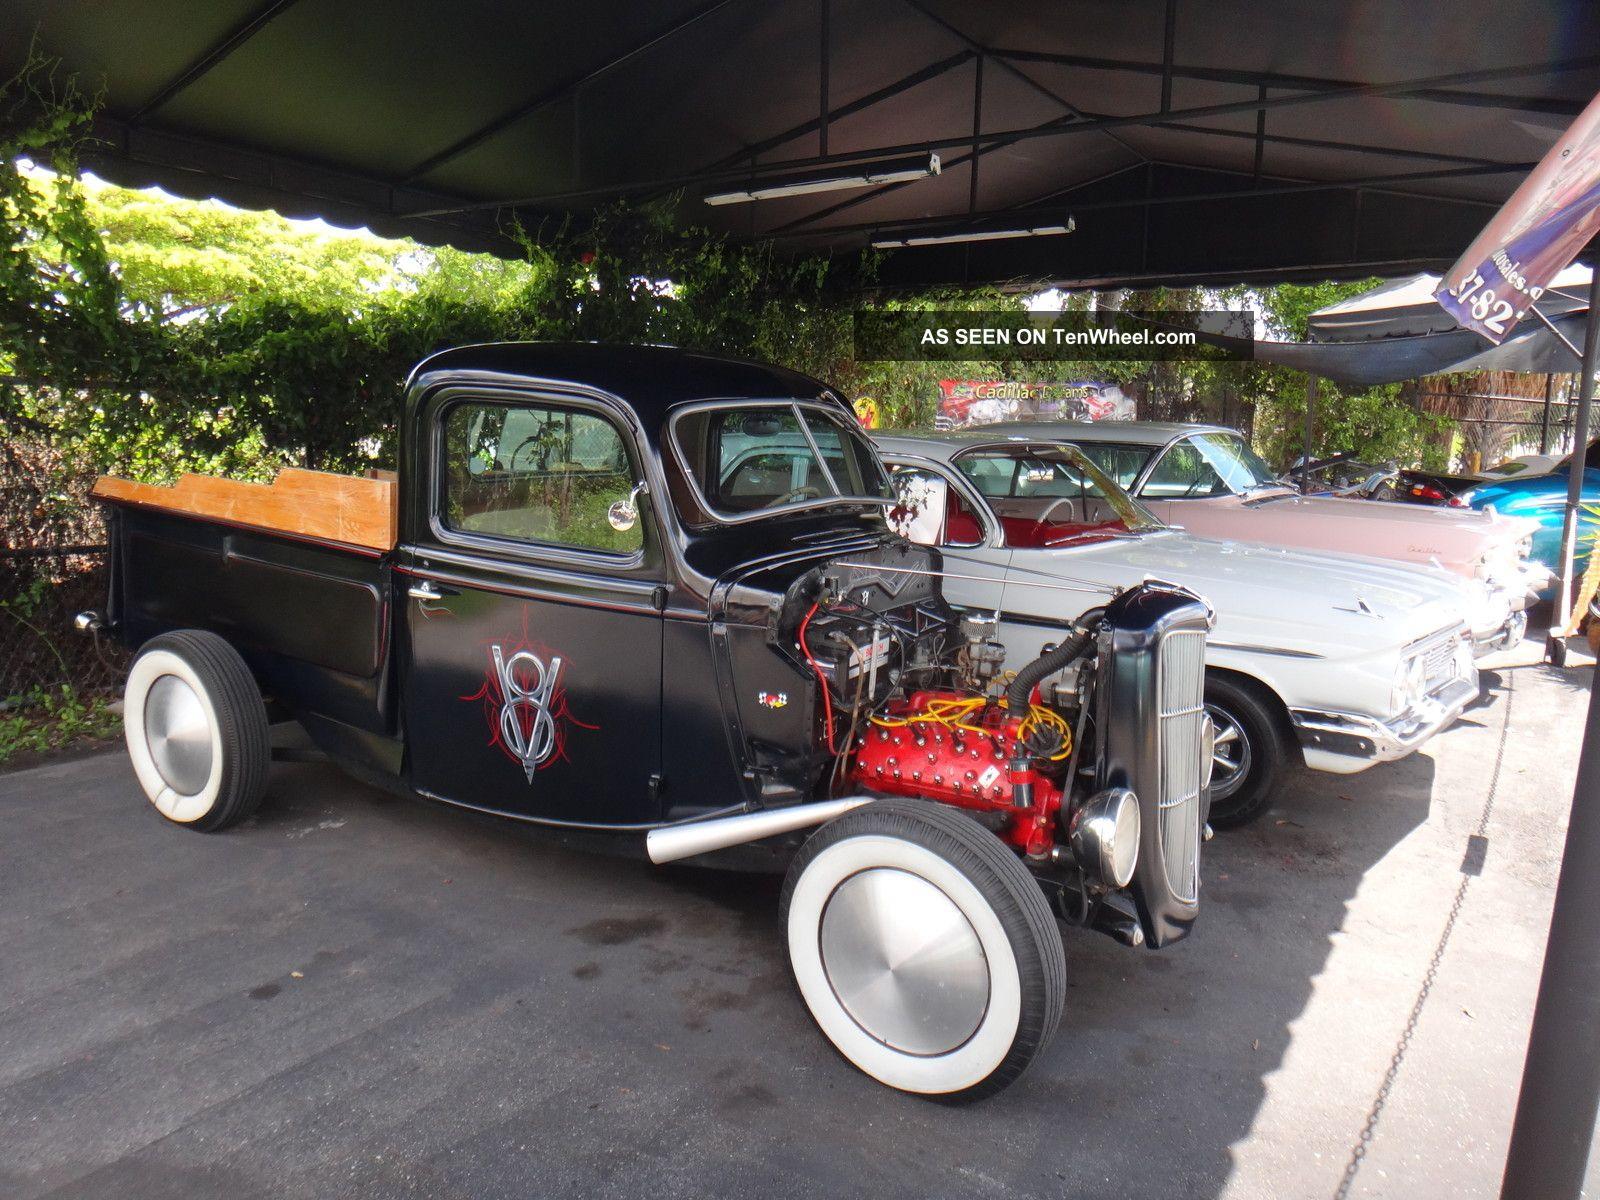 1938 Ford Flathead Rat Rod Hot Rod Mat Black Old School Pick Up